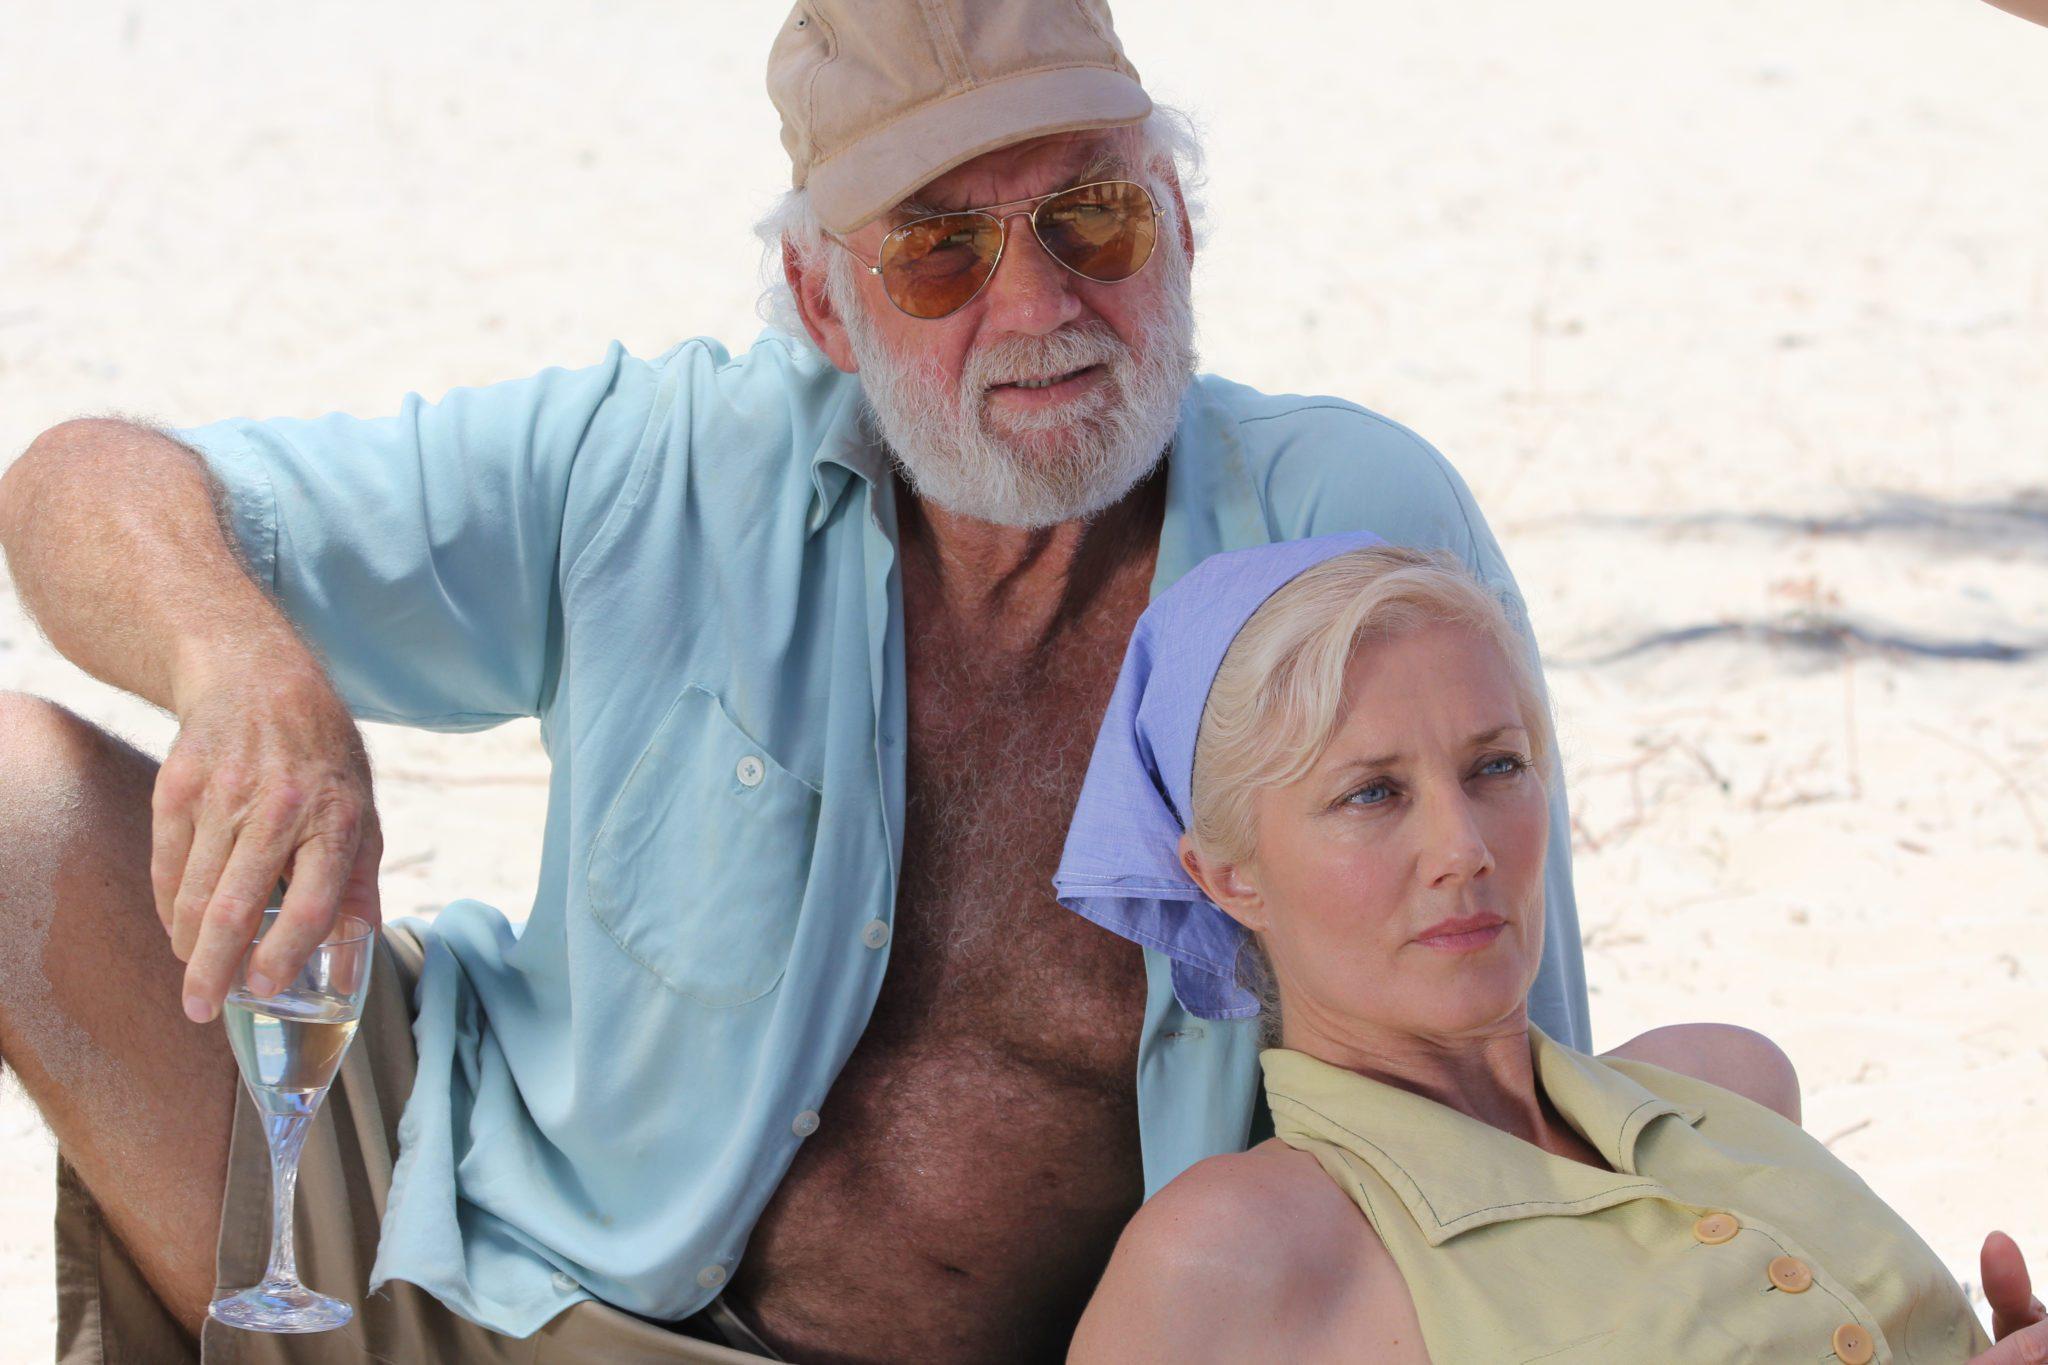 Papa: Hemingway in Cuba – Great Man and His Flaws